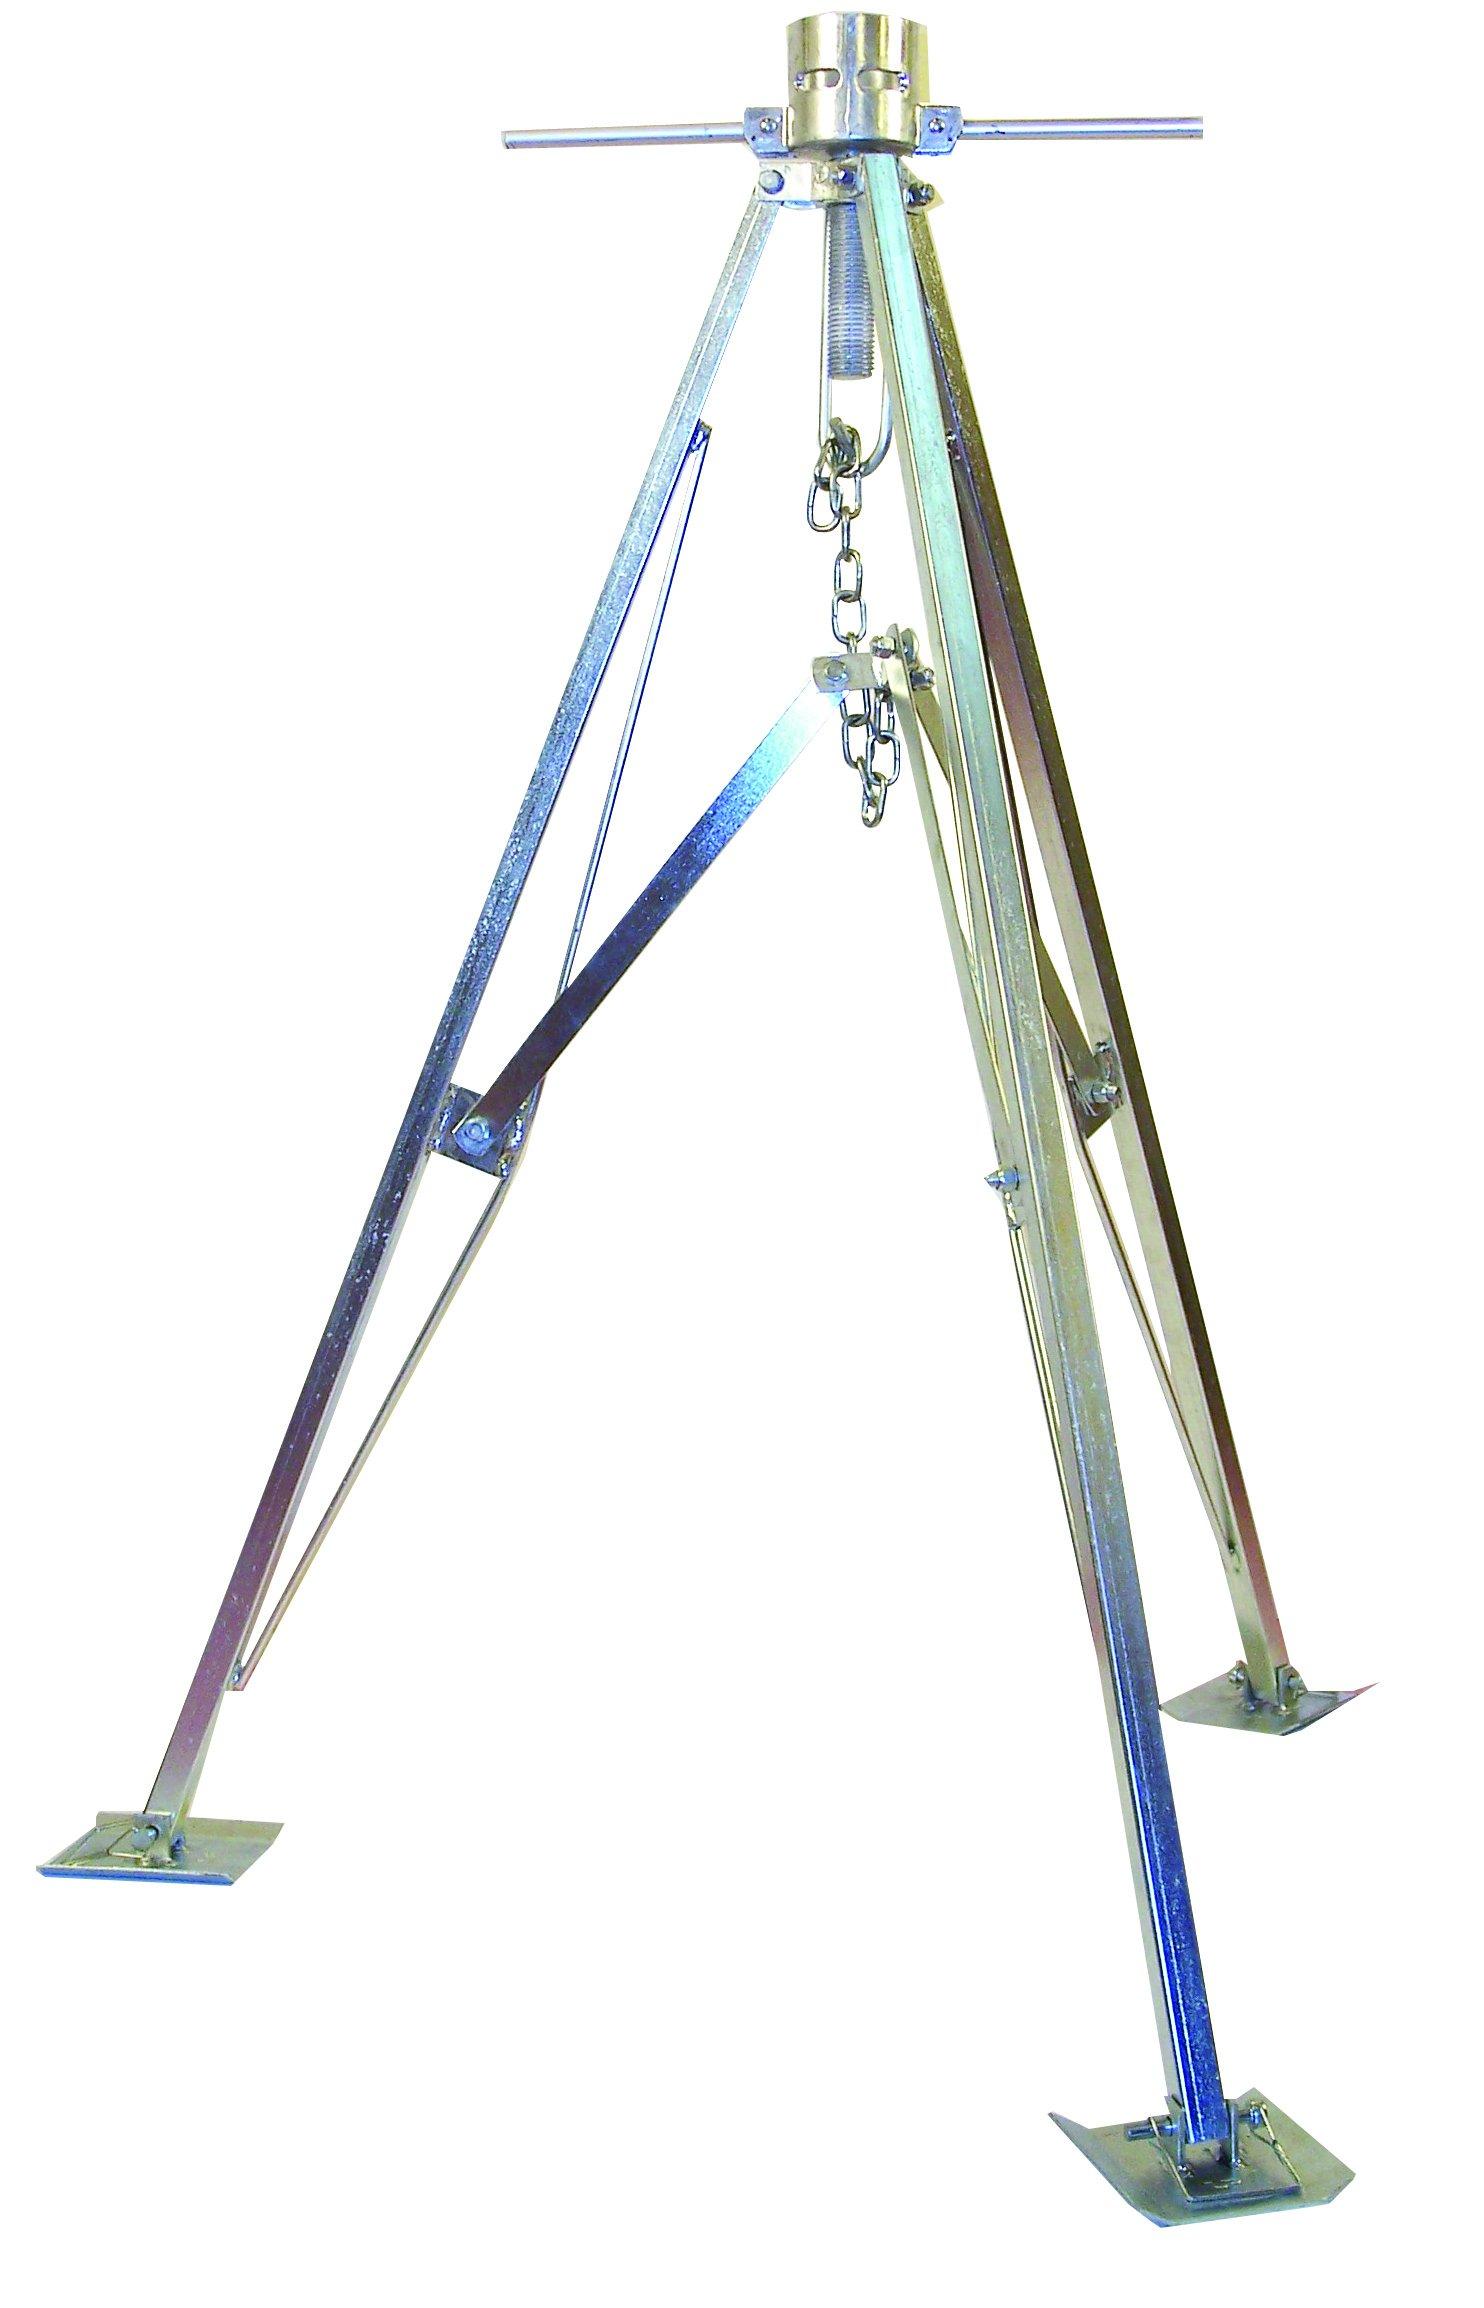 Ultra-Fab 19-950001 King Pin Tripod 5th Wheel Stabilizer by Ultra-Fab Products